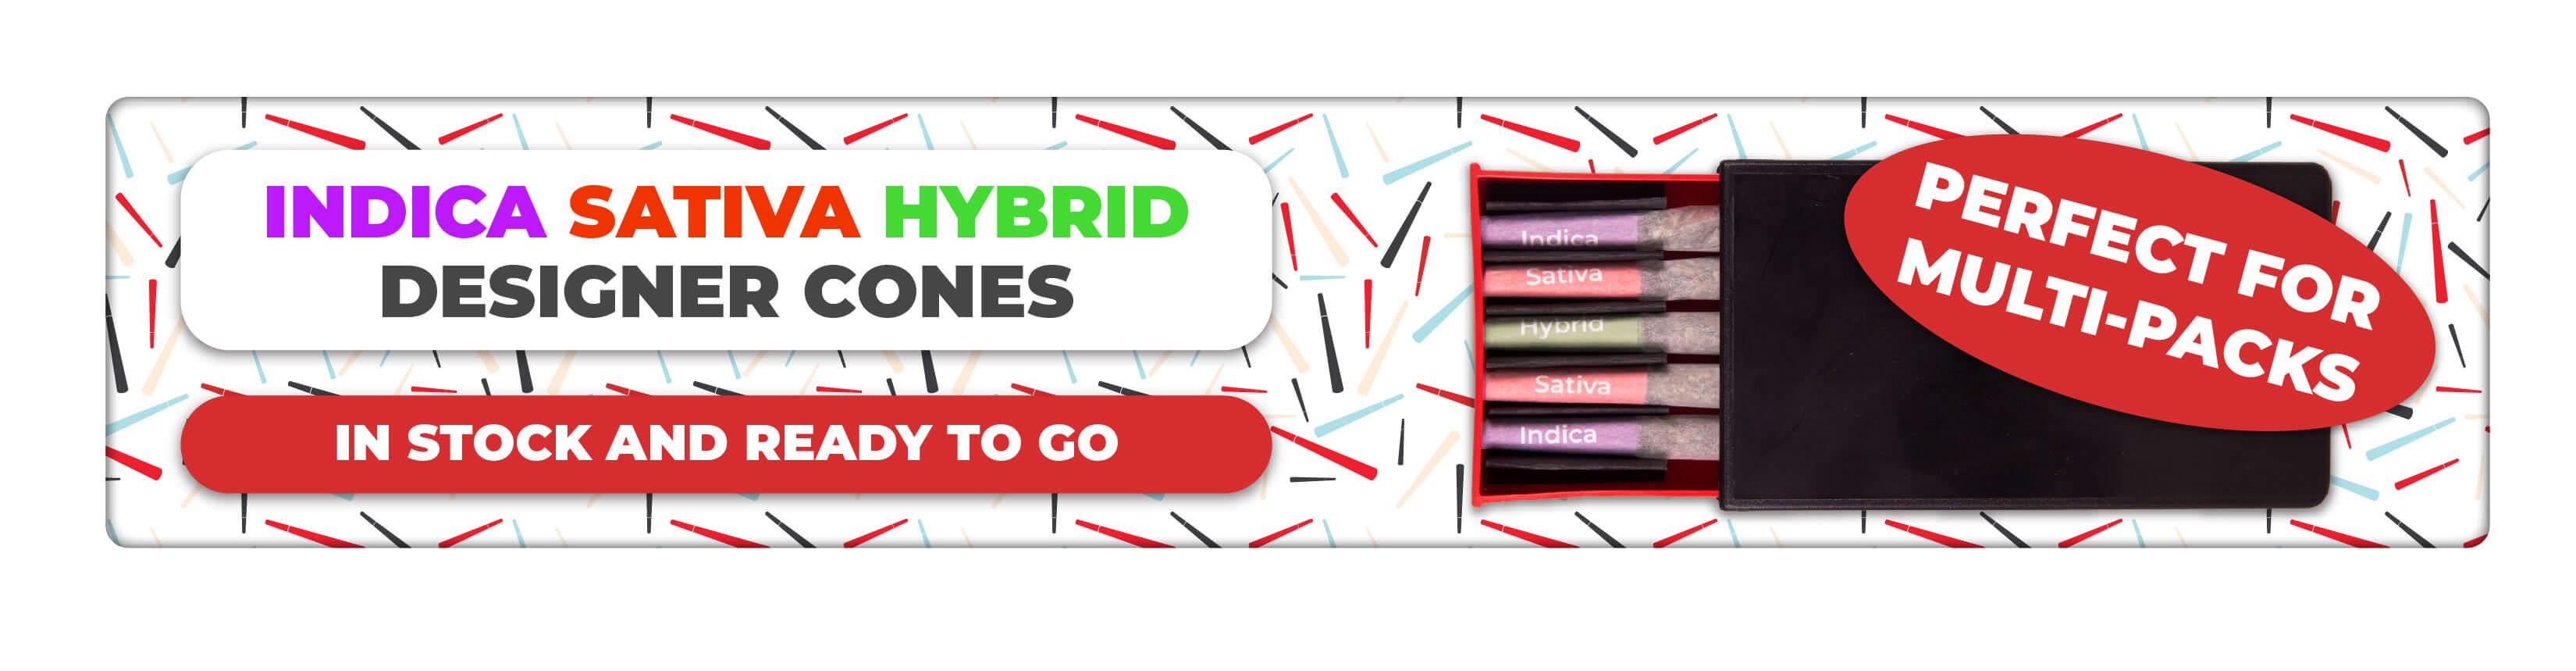 Indica Sativa Hybrid Designer Cone Banner with Pre-Roll Slider Pack